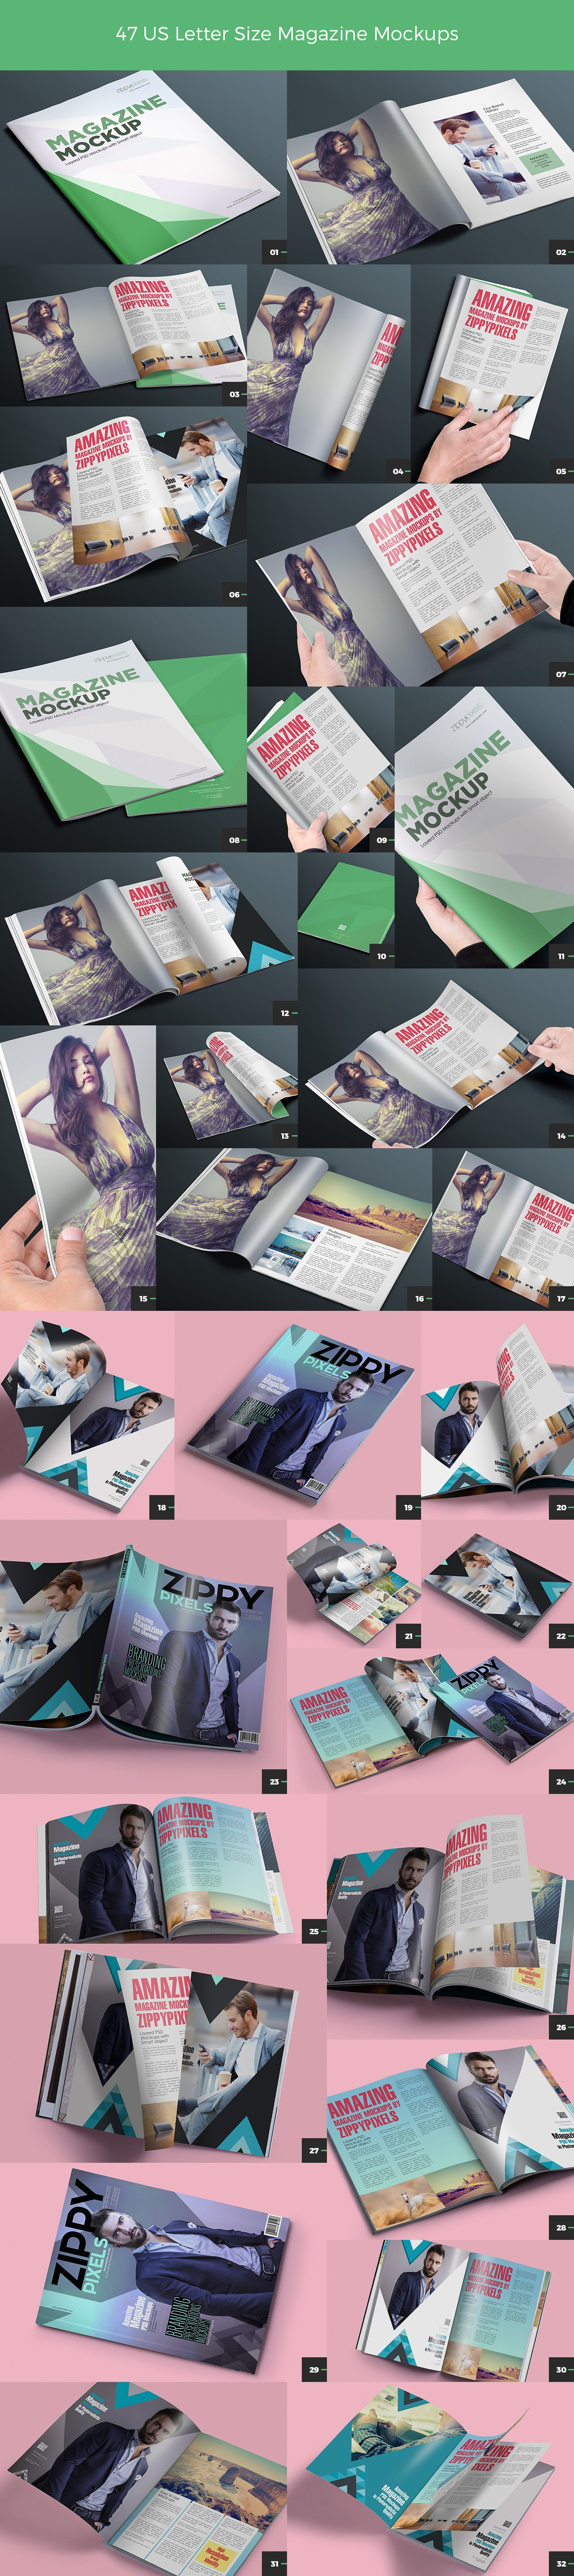 us-letter-size-magazine-mockups-bundle-1